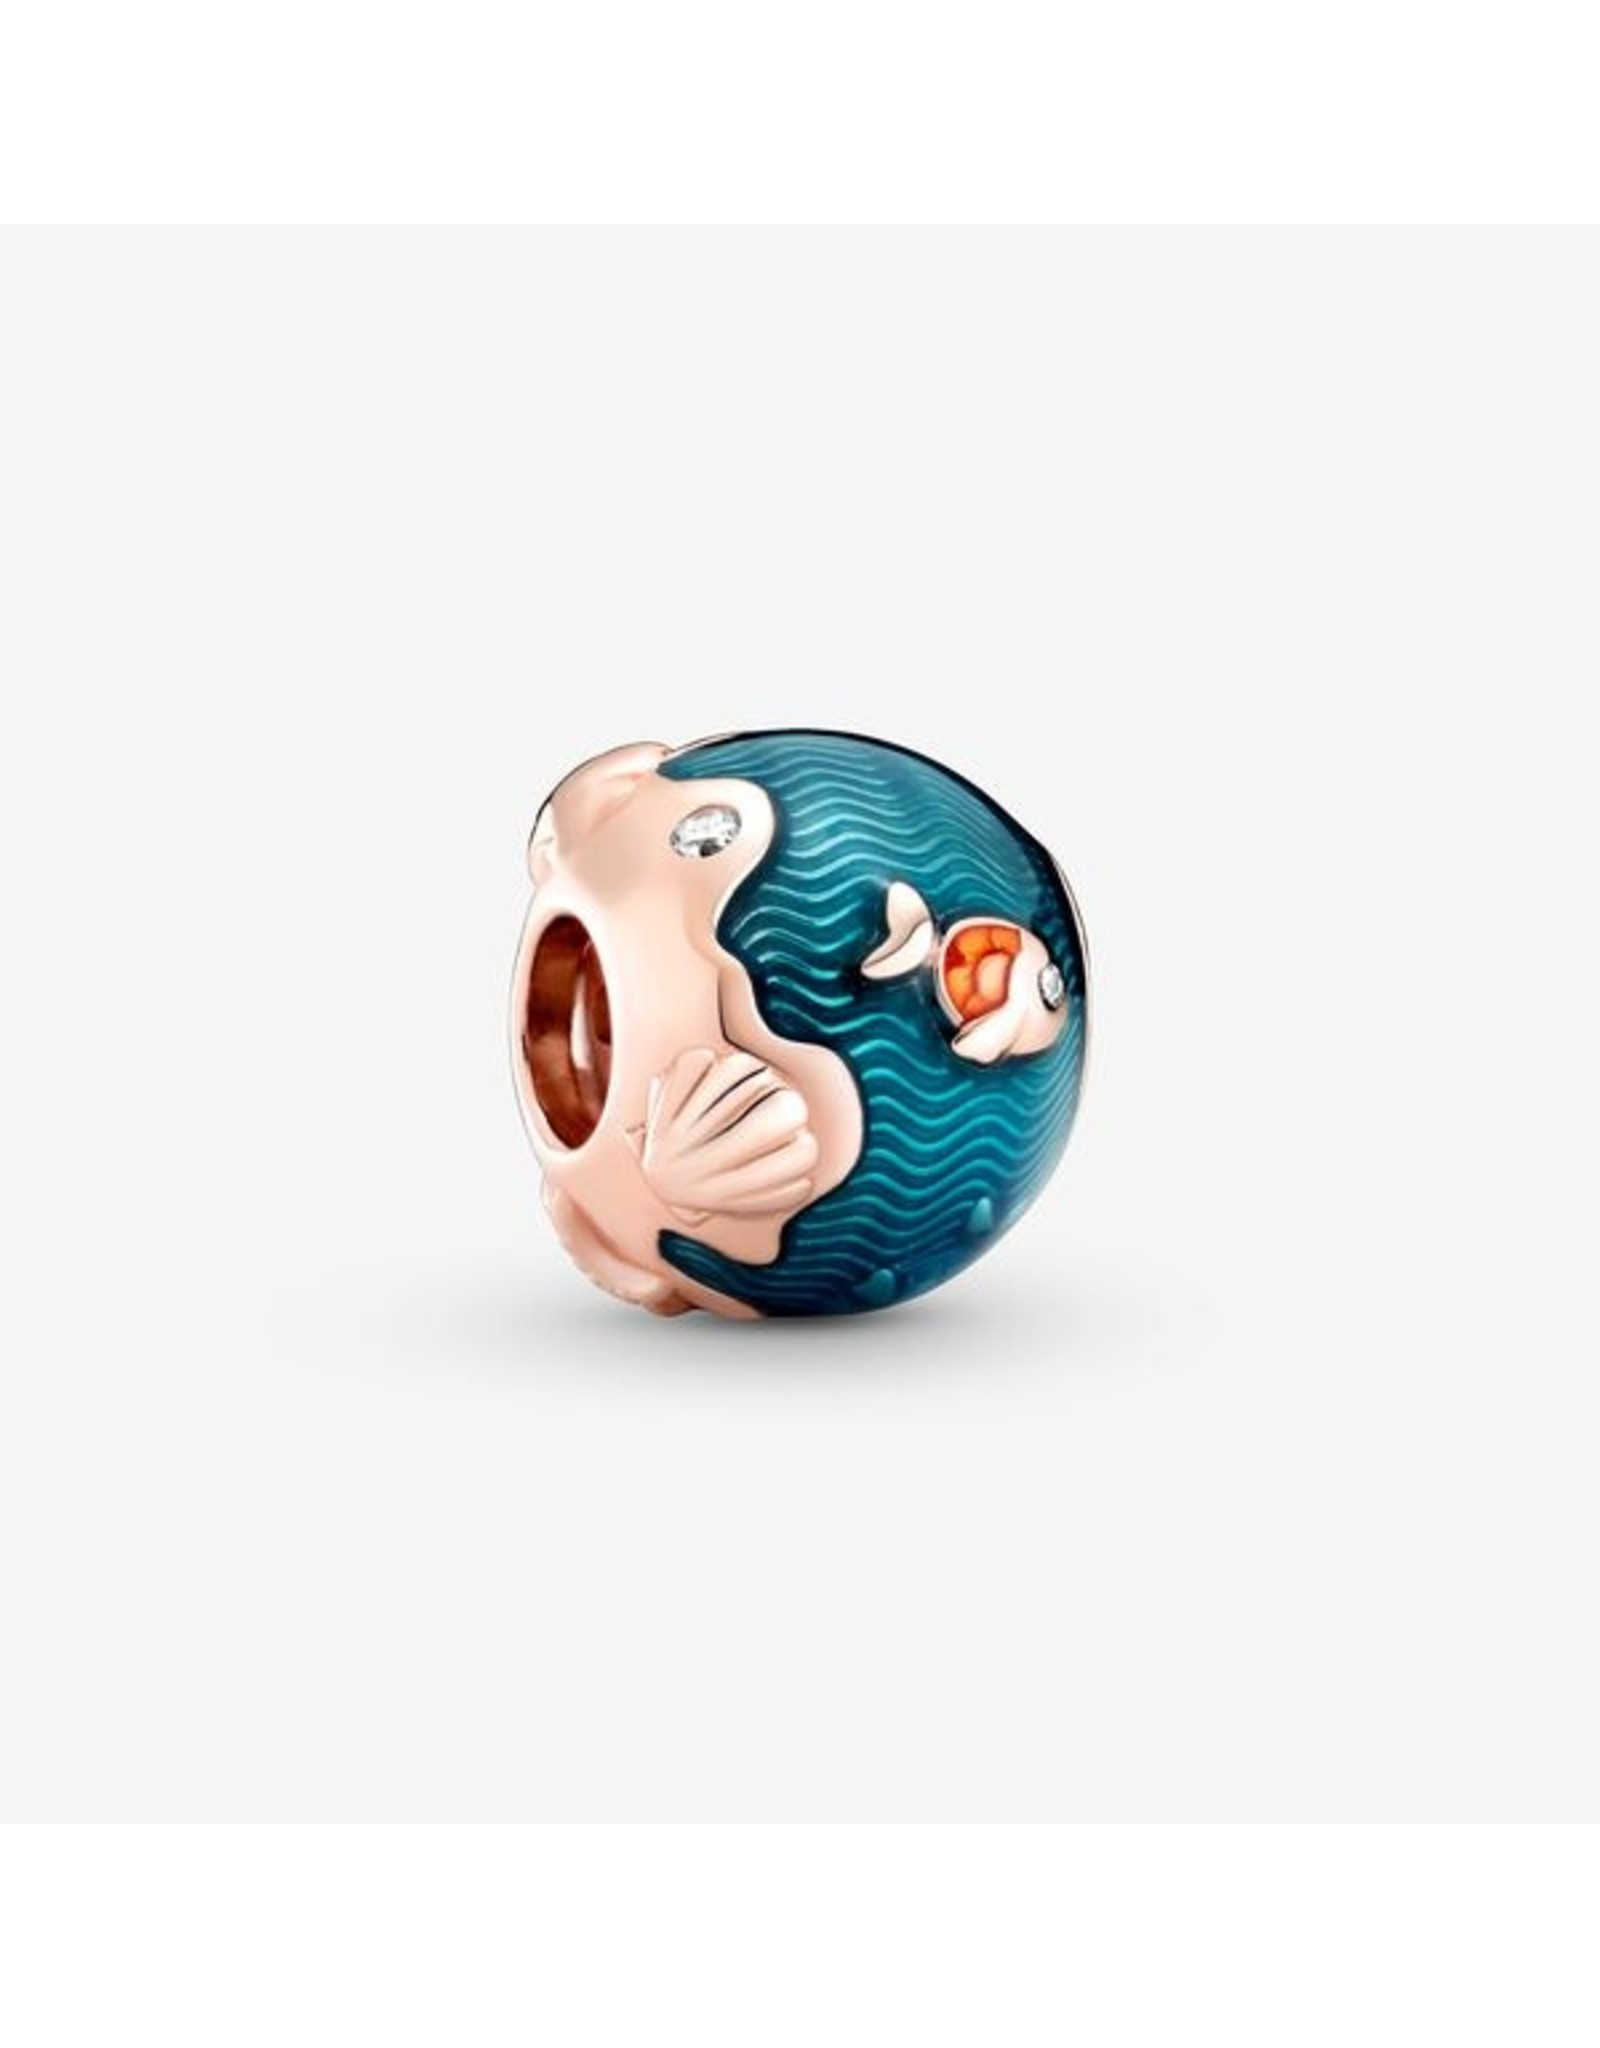 Pandora Pandora Charm,789004C01, Shimmering Ocean Waves & Fish, Mixed Enamel&Clear CZ